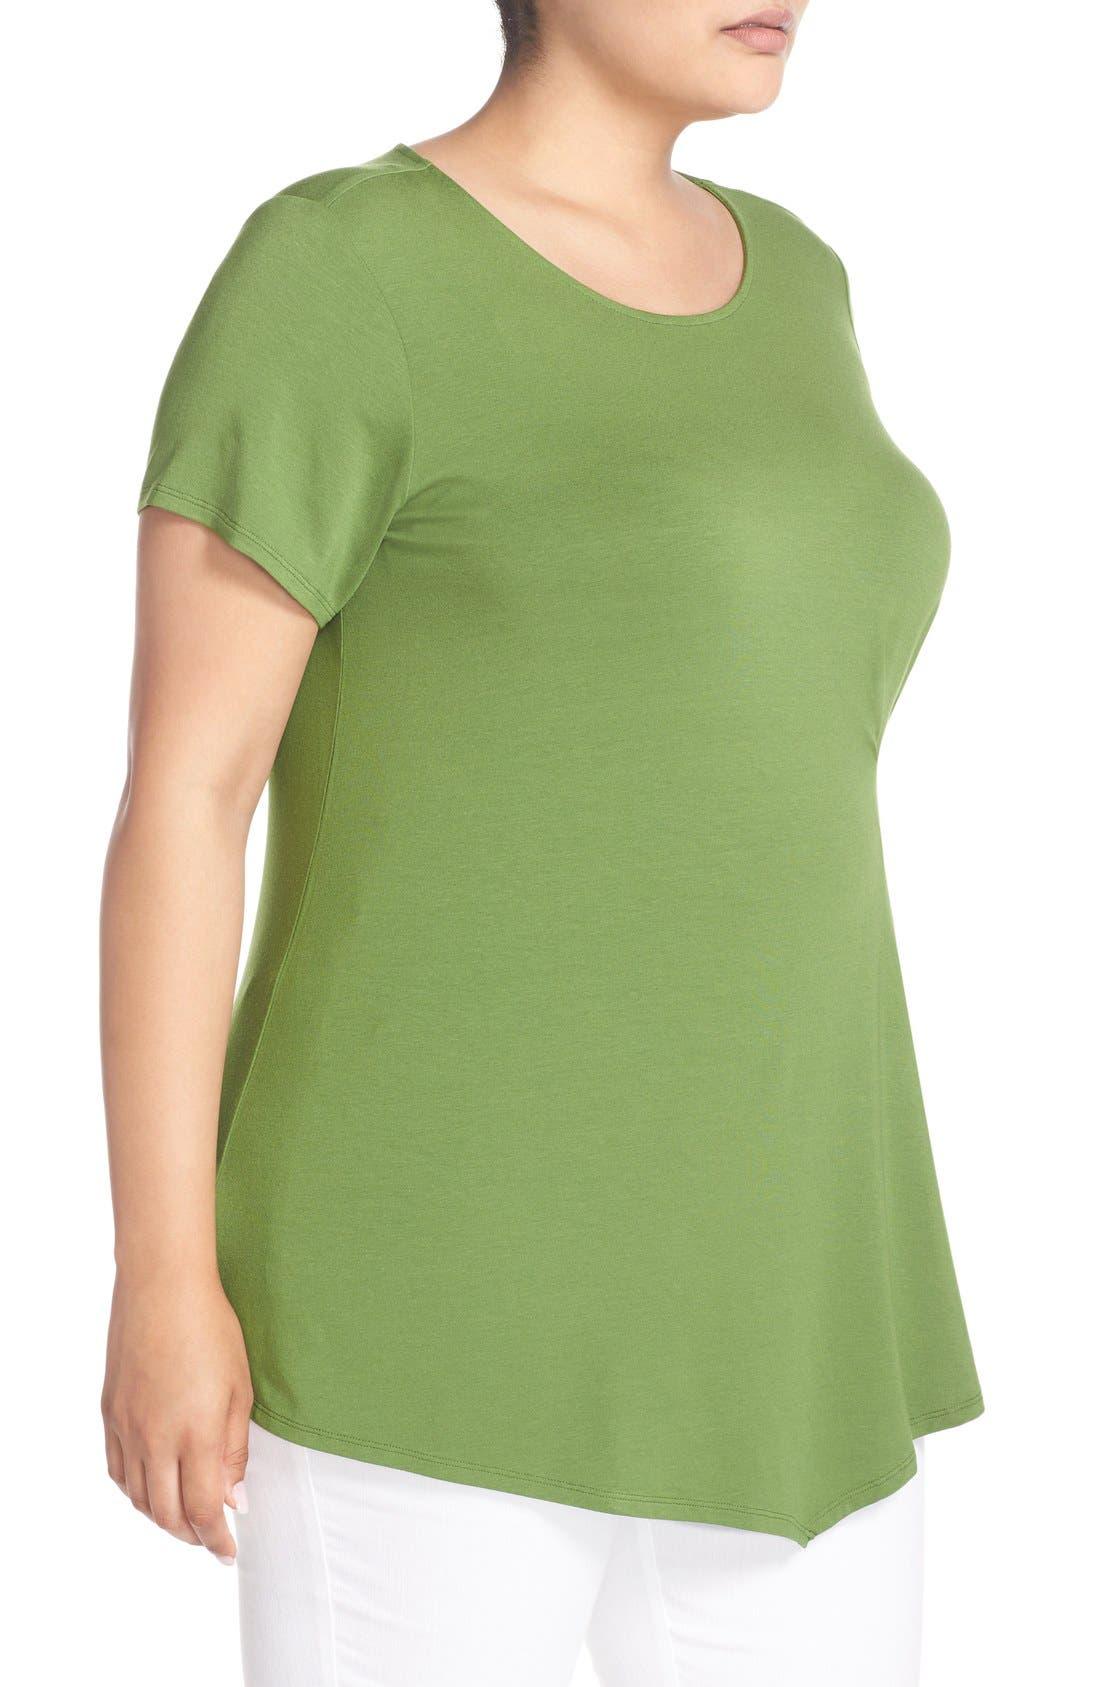 Alternate Image 3  - Vince Camuto Short Sleeve Side Pleat Asymmetrical Top (Plus Size)